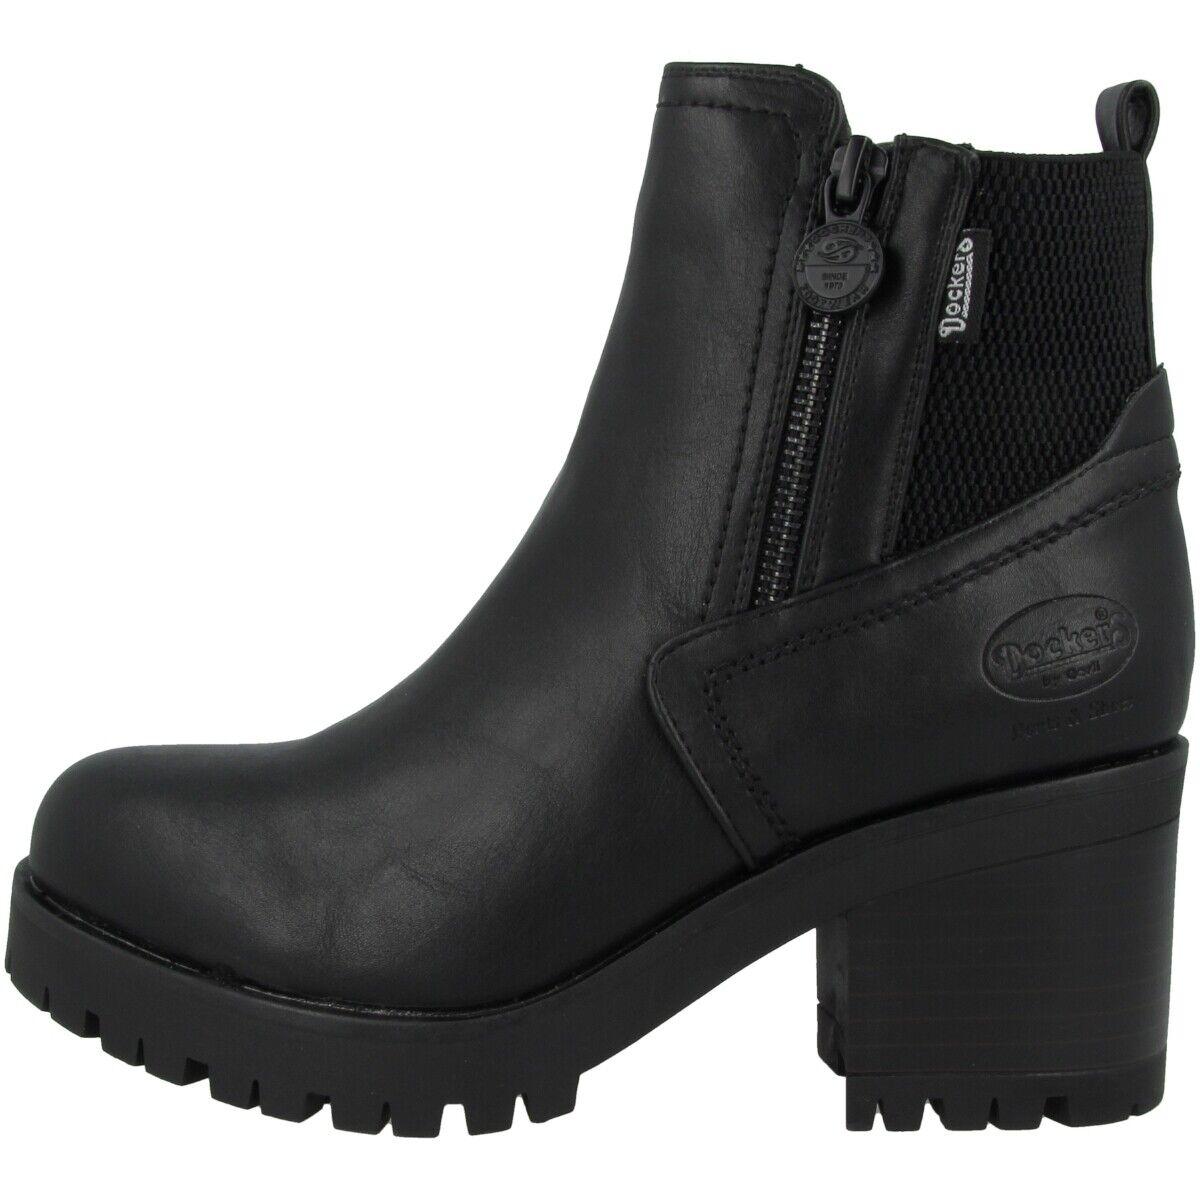 Dockers by Gerli 37CE221 Schuhe Stiefeletten Stiefel Stiefel schwarz 37CE221-610100